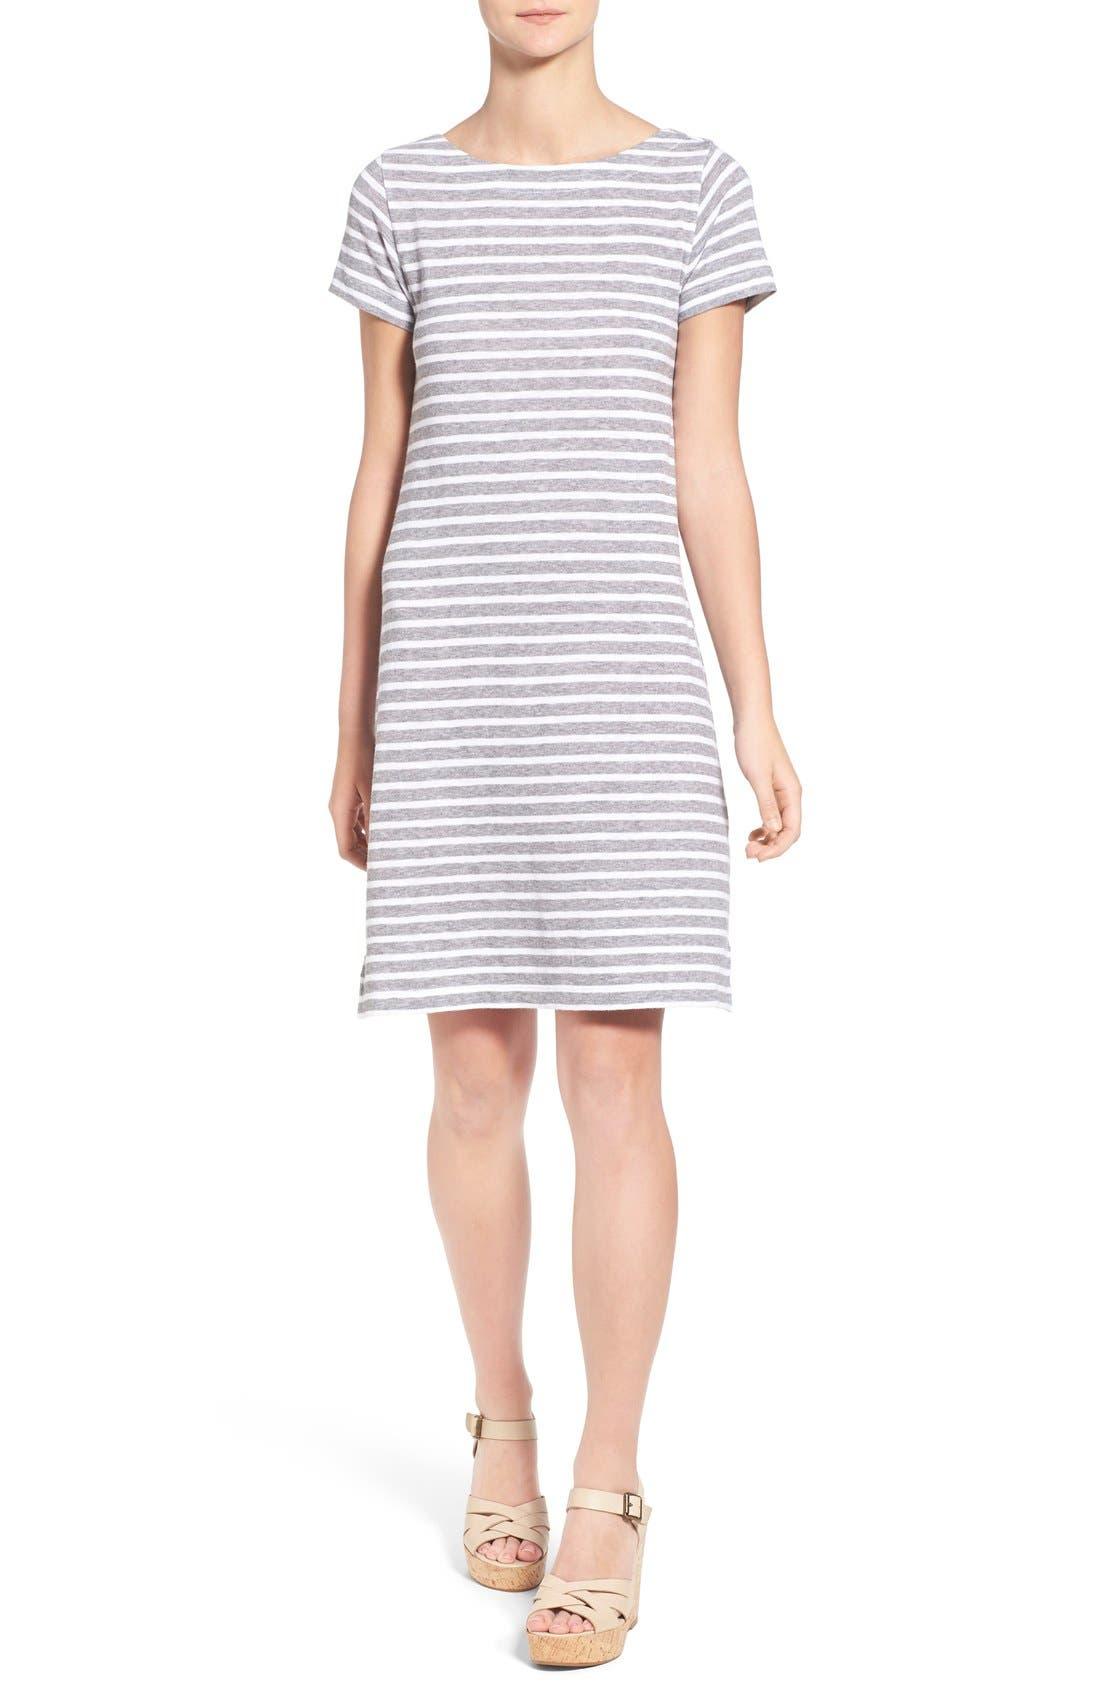 Alternate Image 1 Selected - Vineyard Vines Stripe T-Shirt Dress